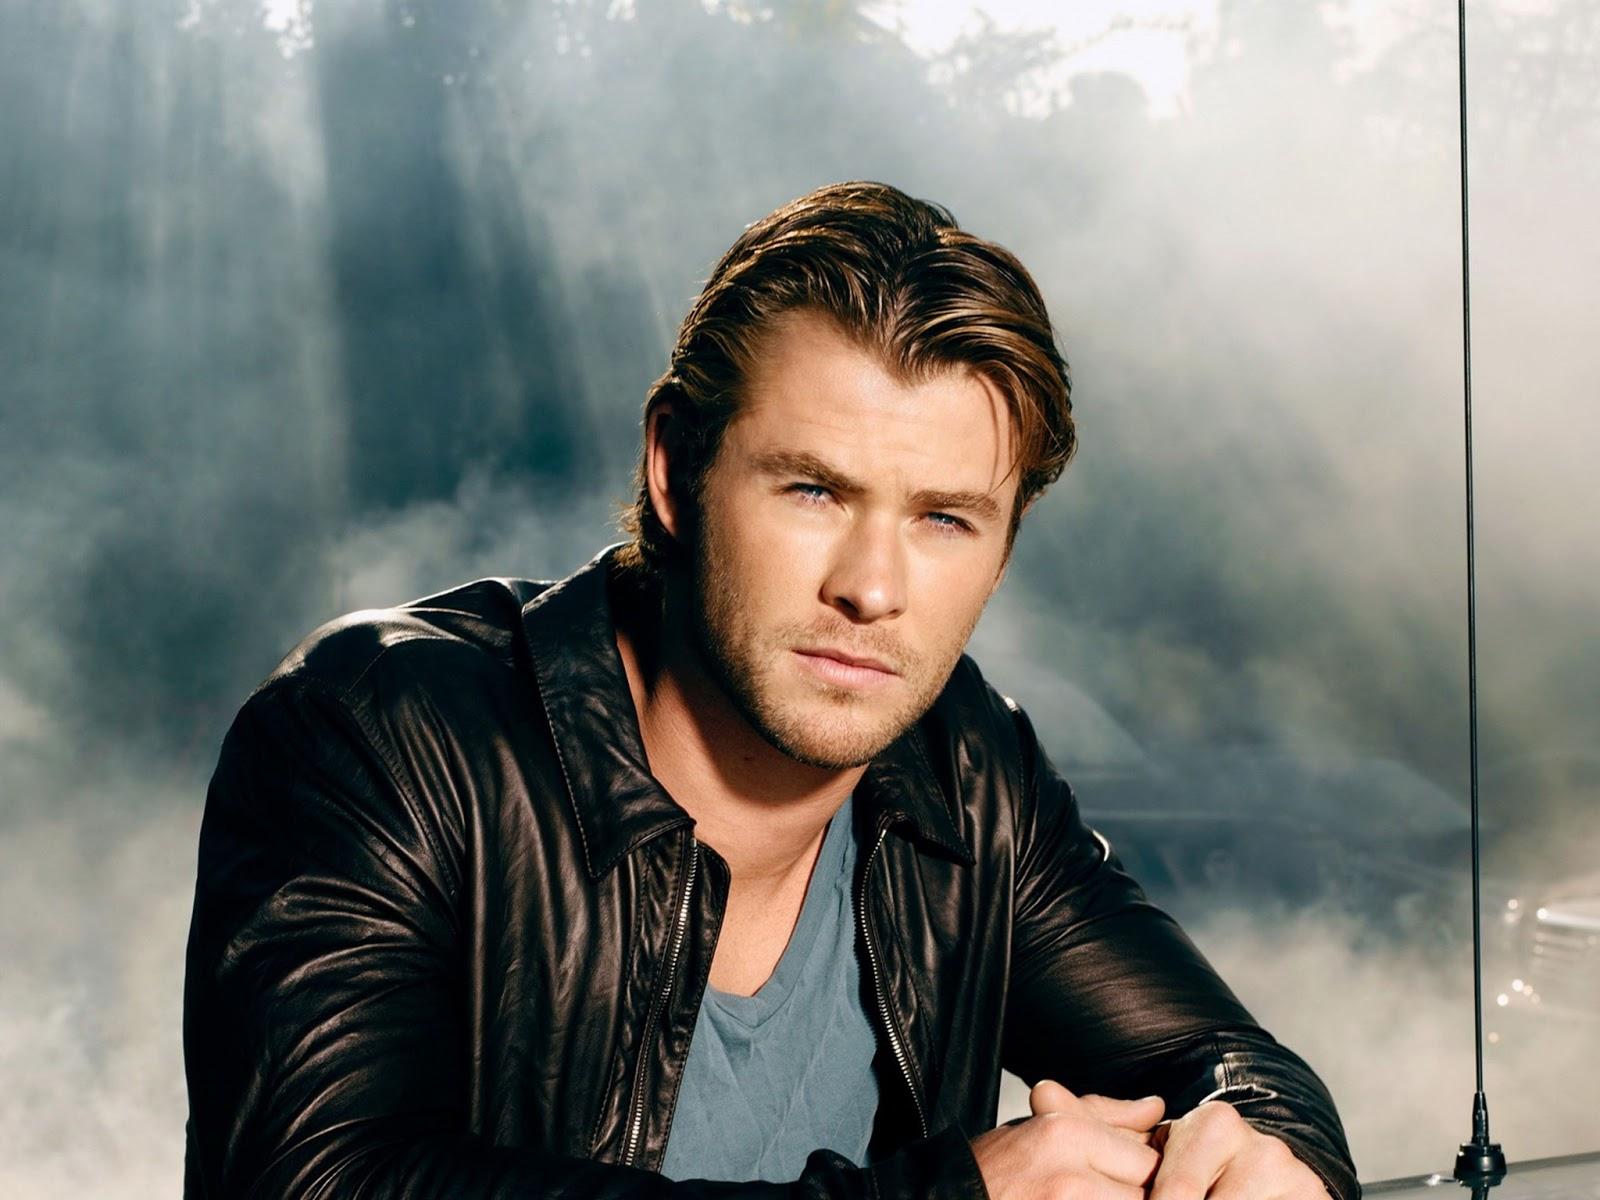 Chris Hemsworth hd Wallpapers 2013   World Sound 1600x1200